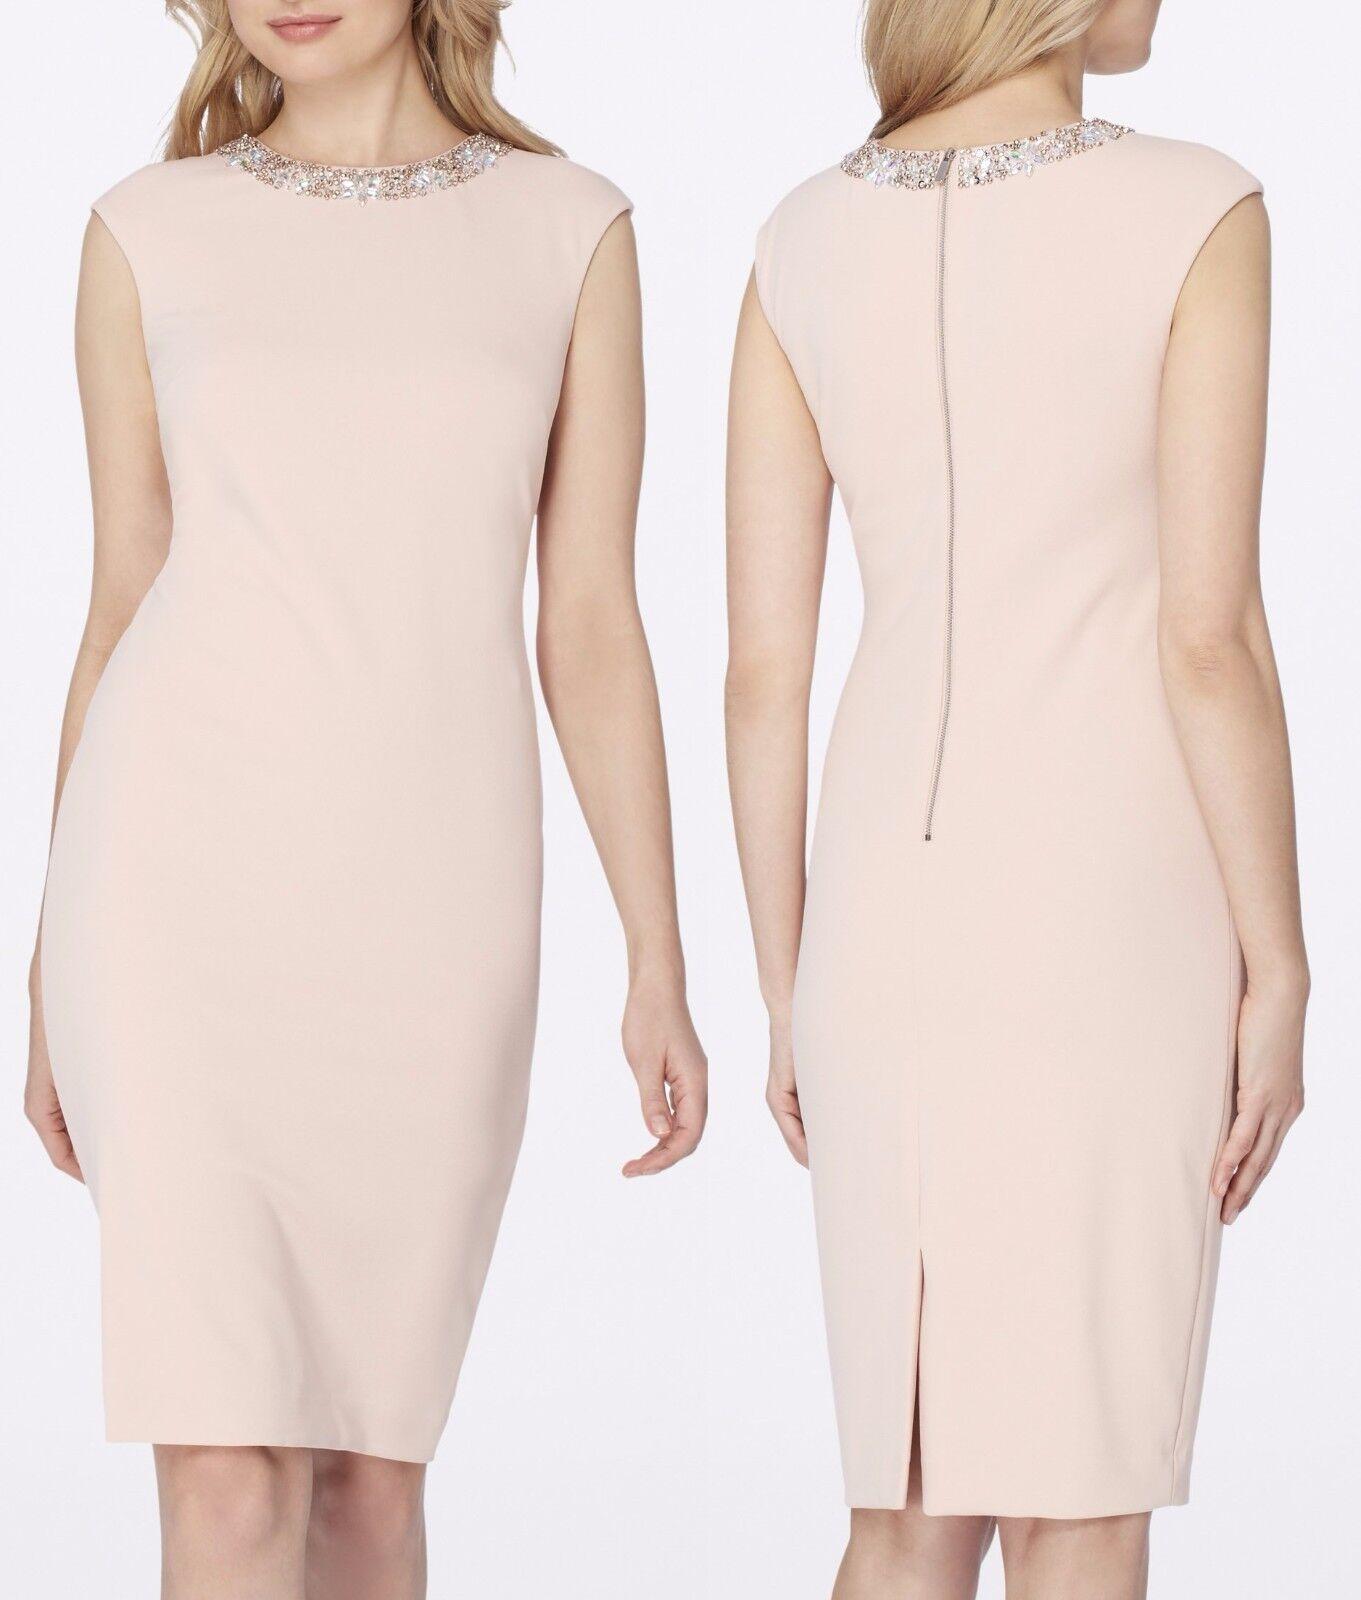 Tahari 7120M182 Blaush Rosa Jeweled Neck Stretch Crepe Sheath Dress, 4R -